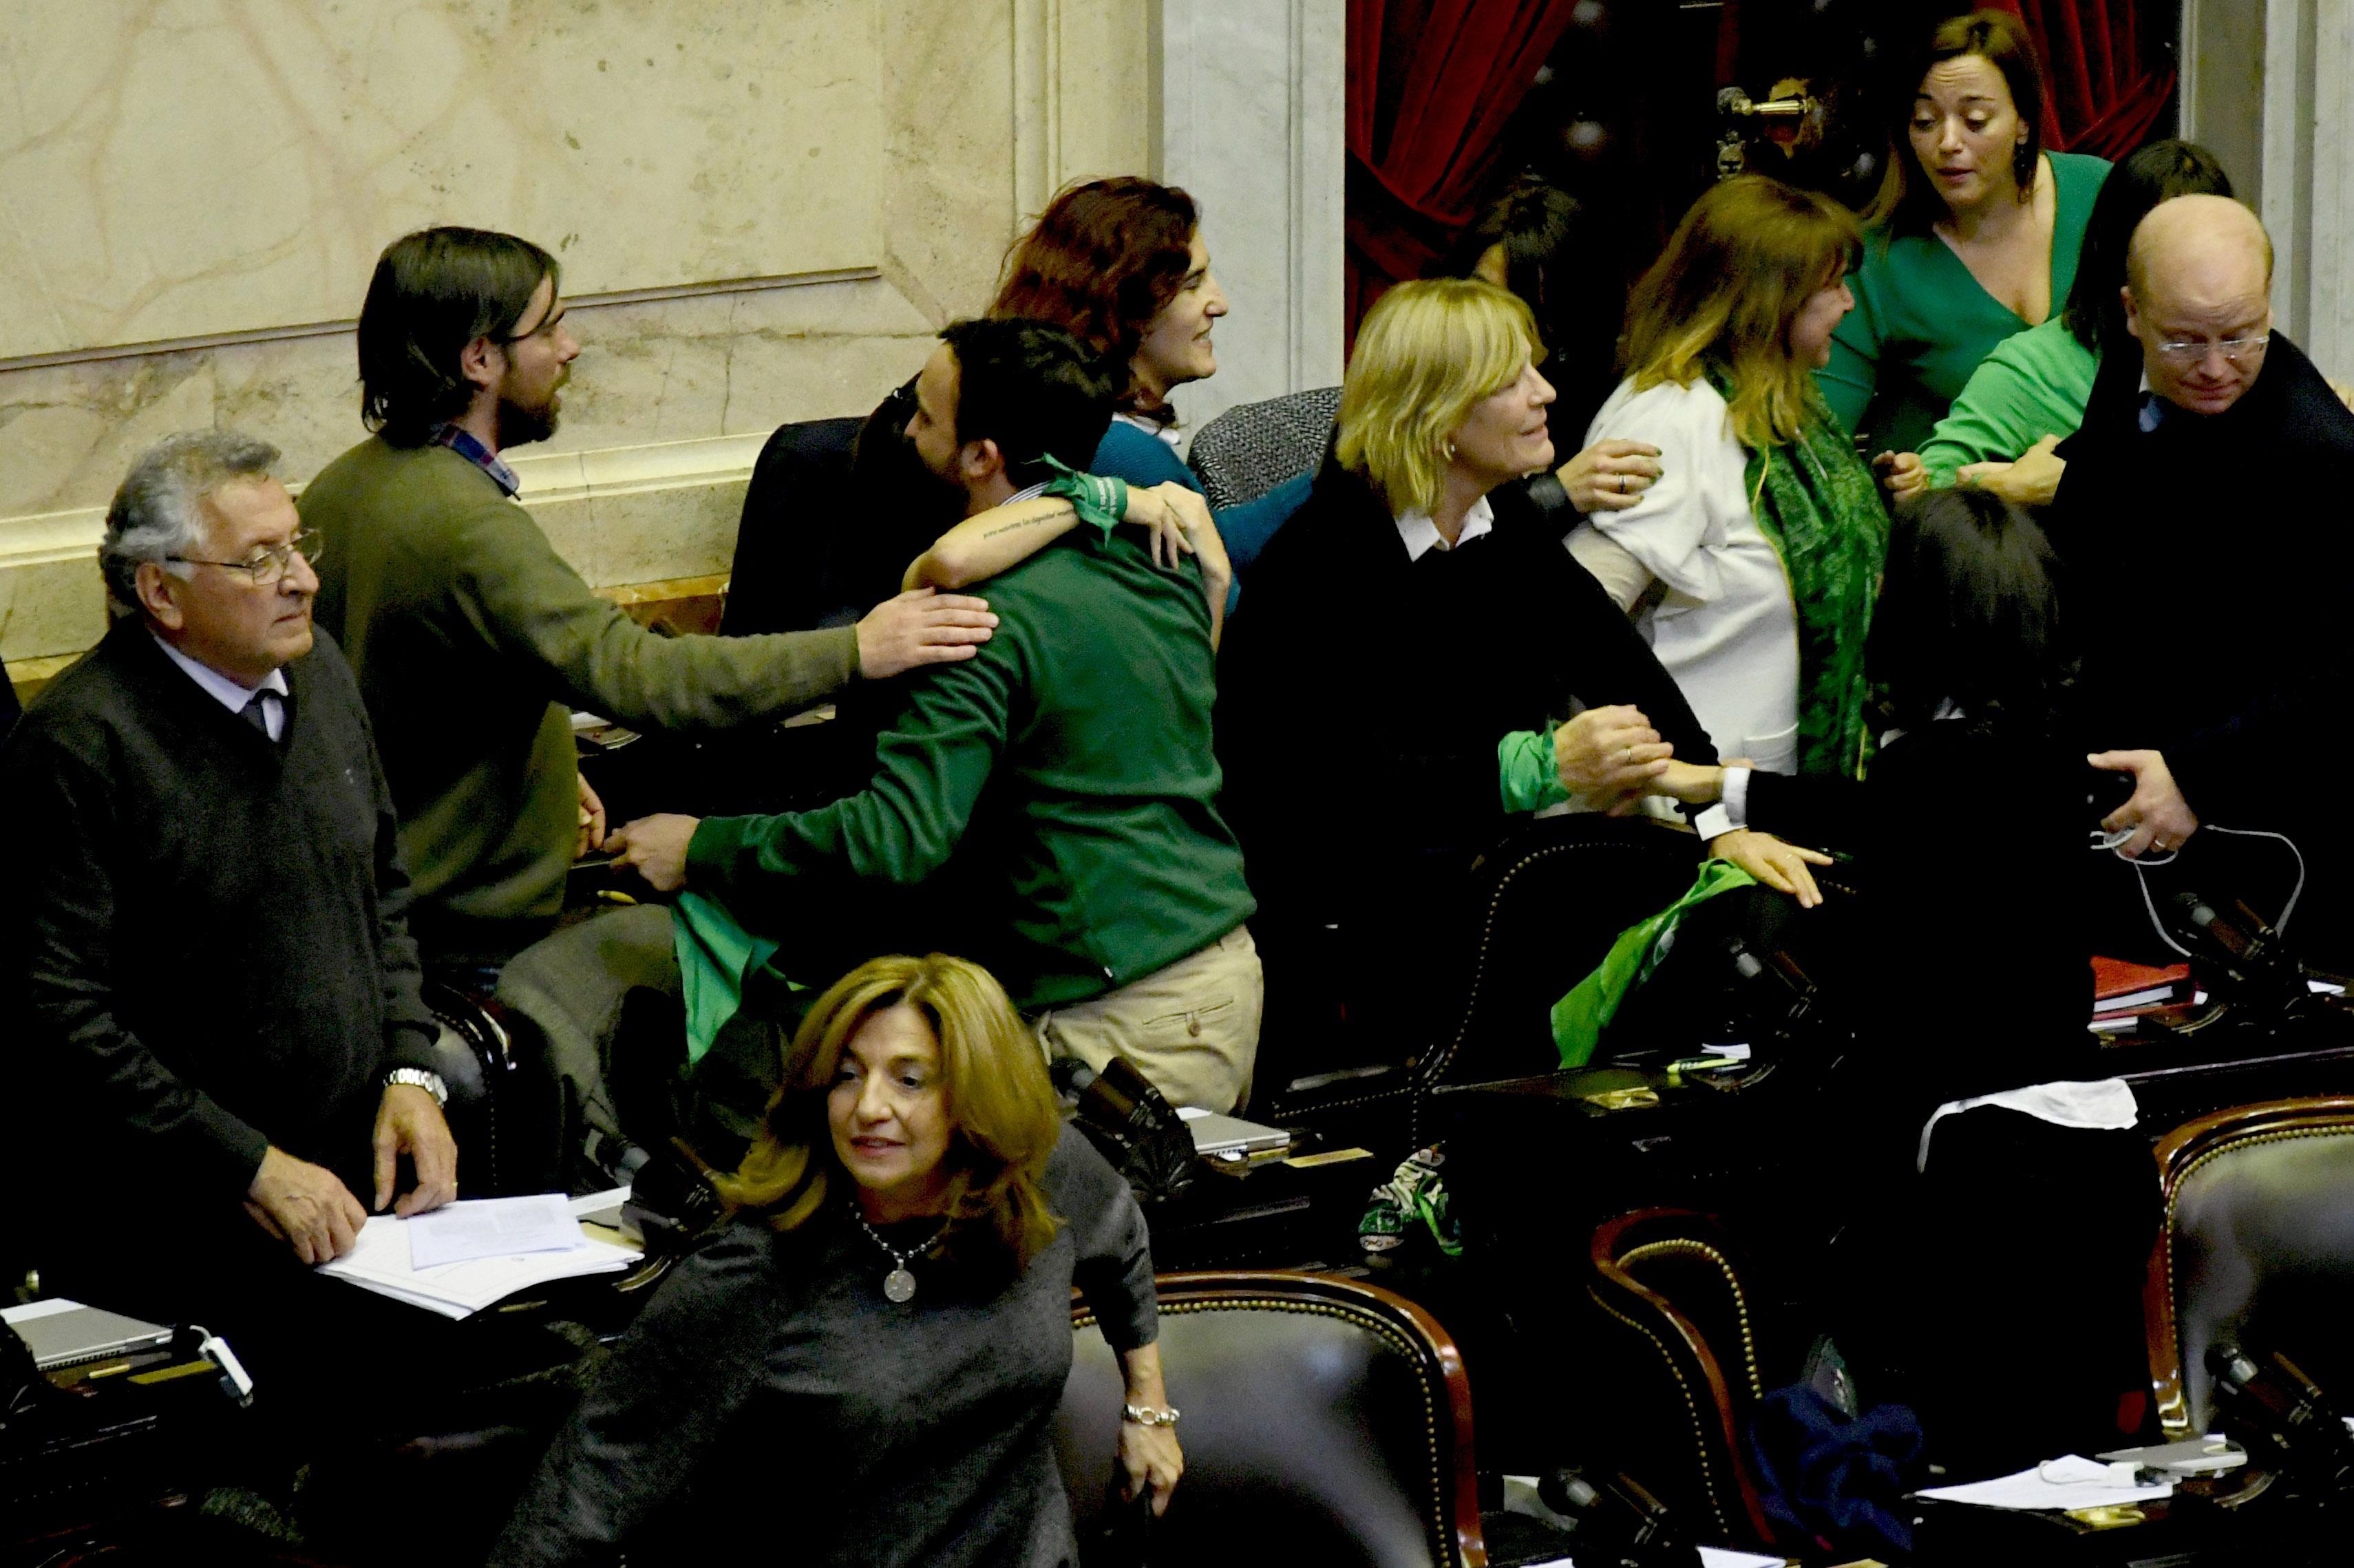 Diputados se abrazan; Frana y Contigiani se retiran derrotados (Télam)